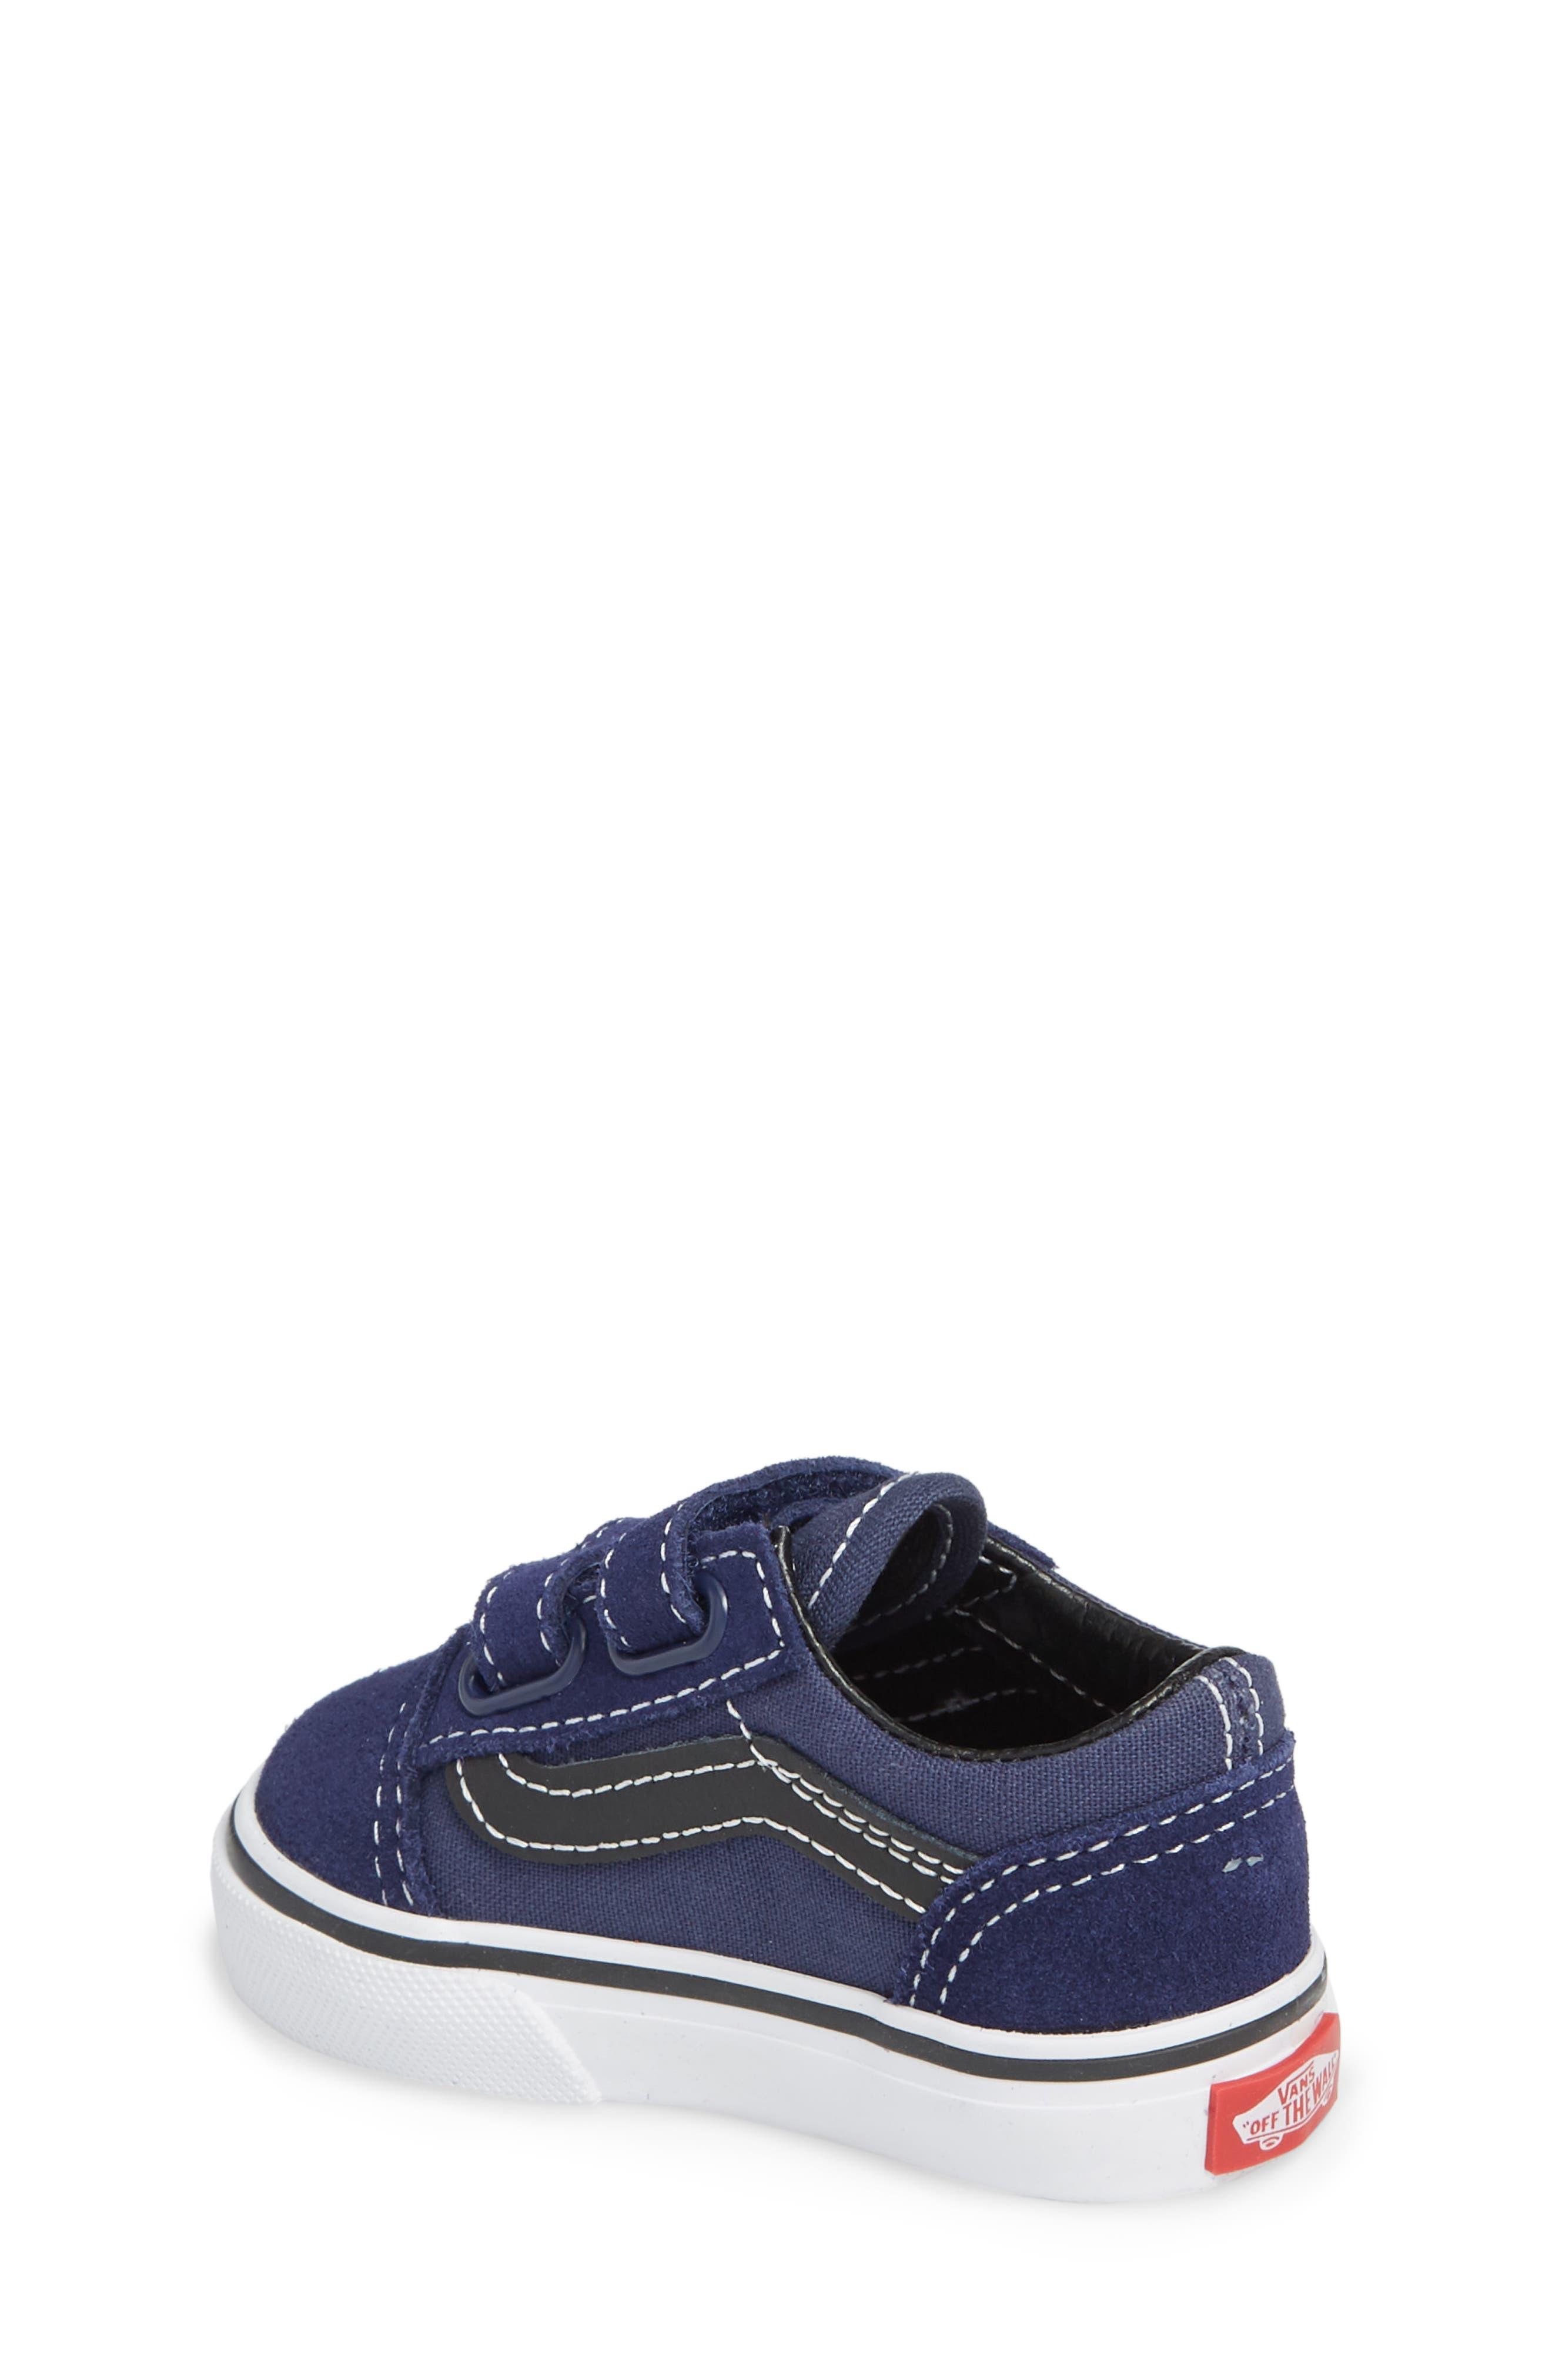 Old Skool V Sneaker,                             Alternate thumbnail 2, color,                             Medieval Blue/ Black